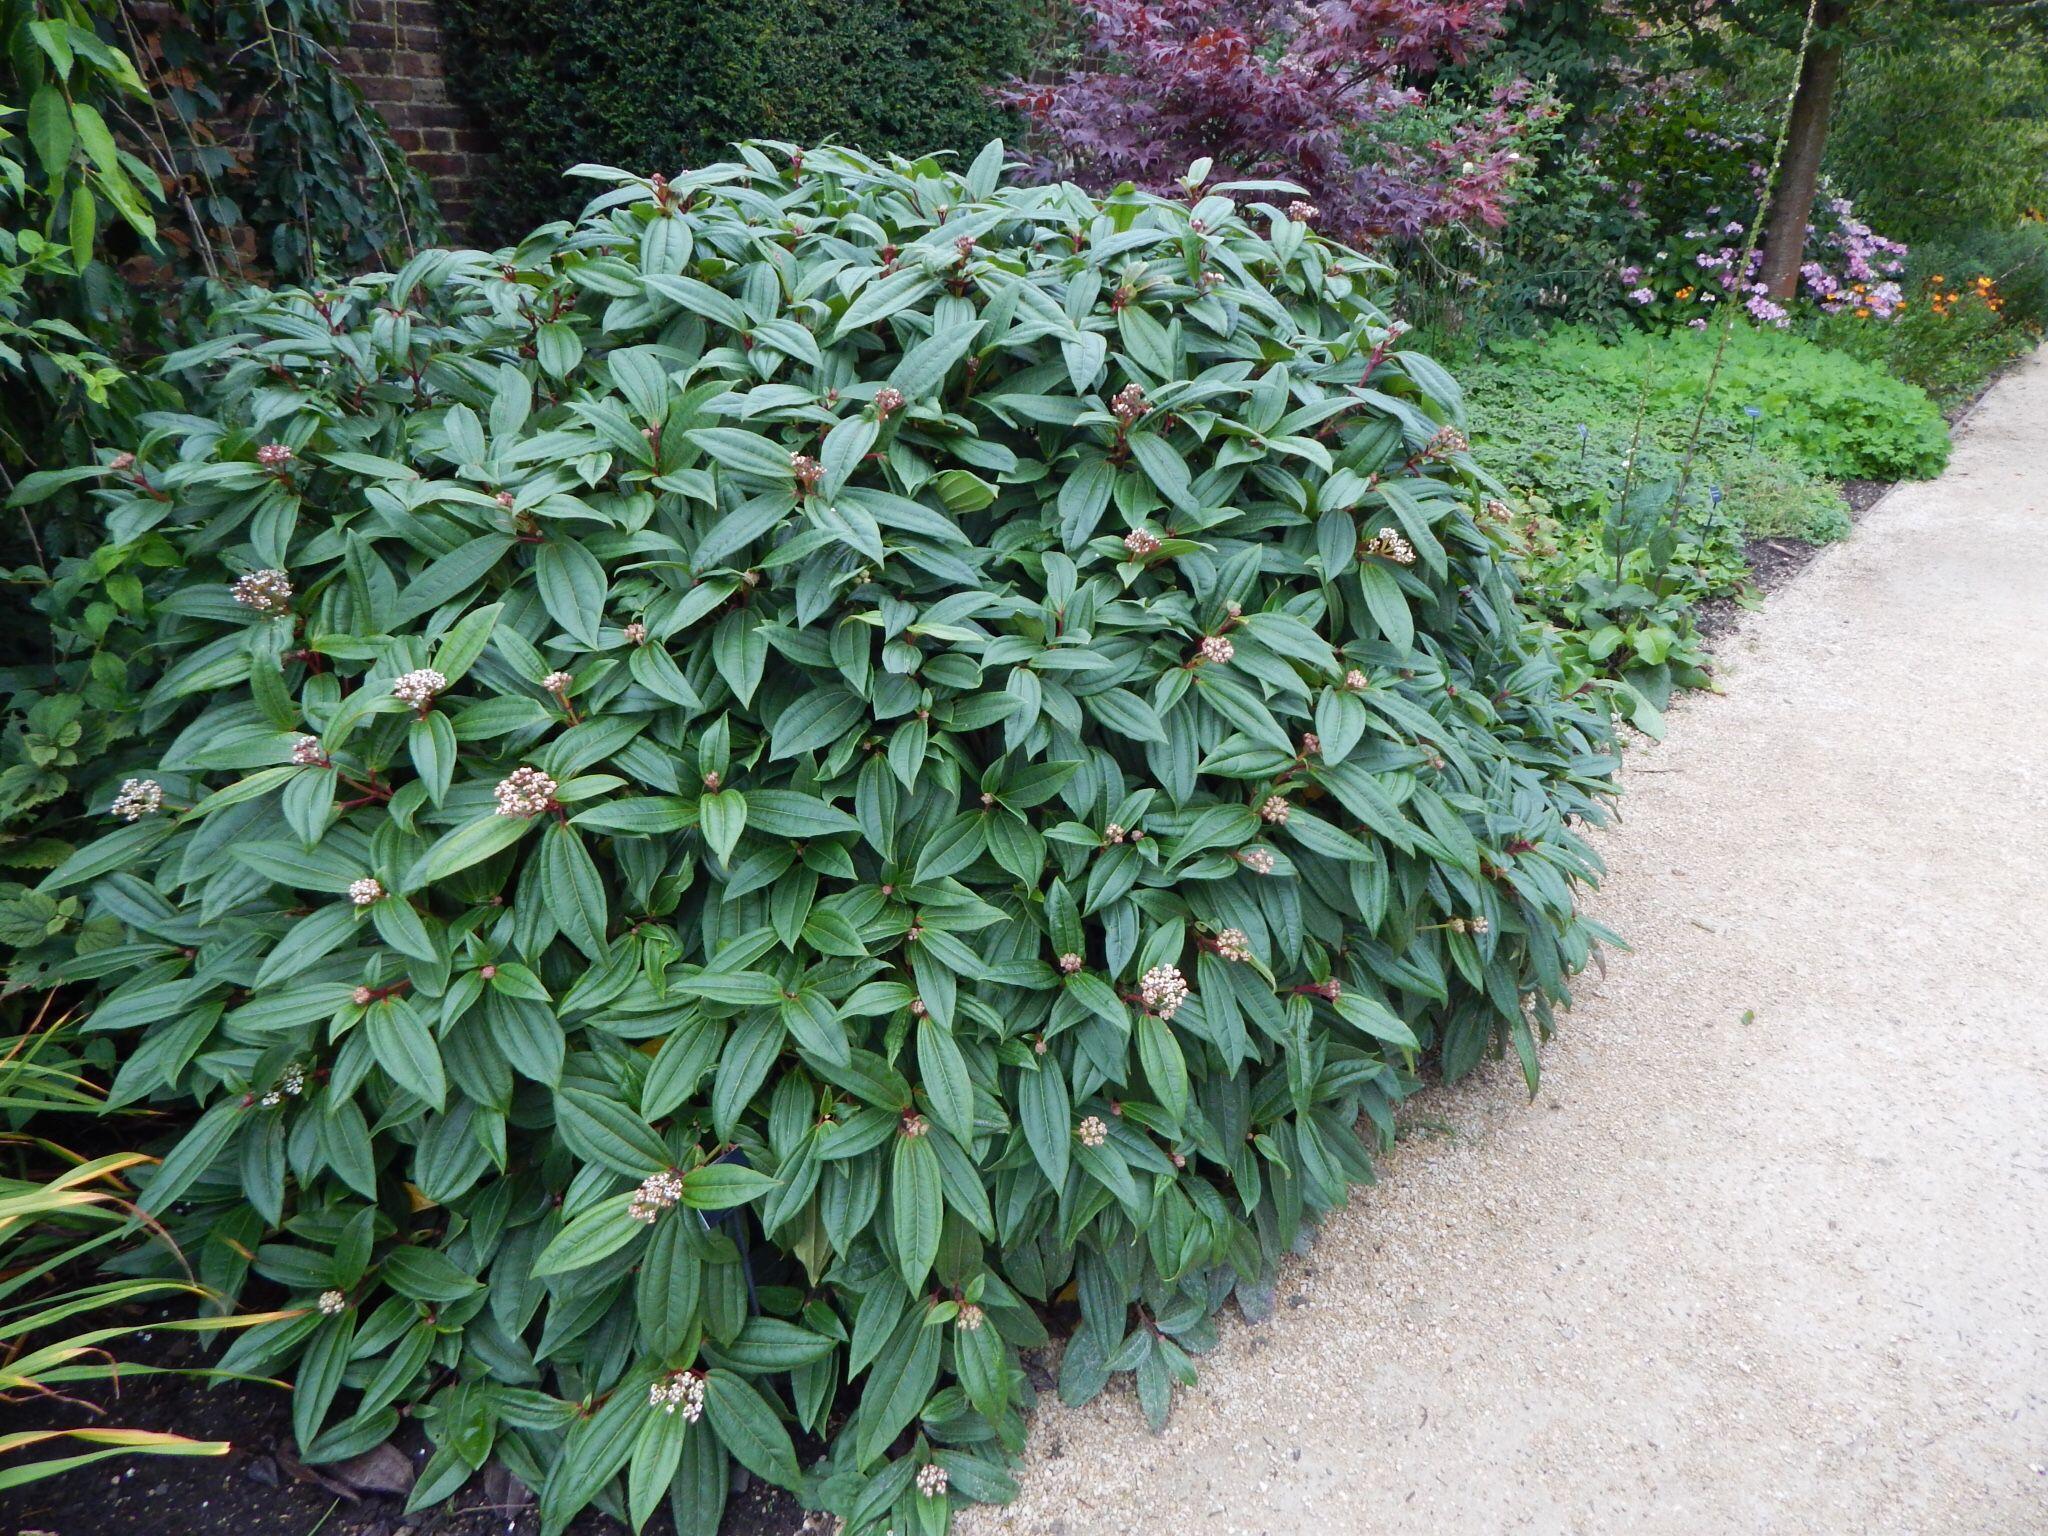 Viburnum Davidii Front Yard Plants Shade Shrubs Evergreens For Shade